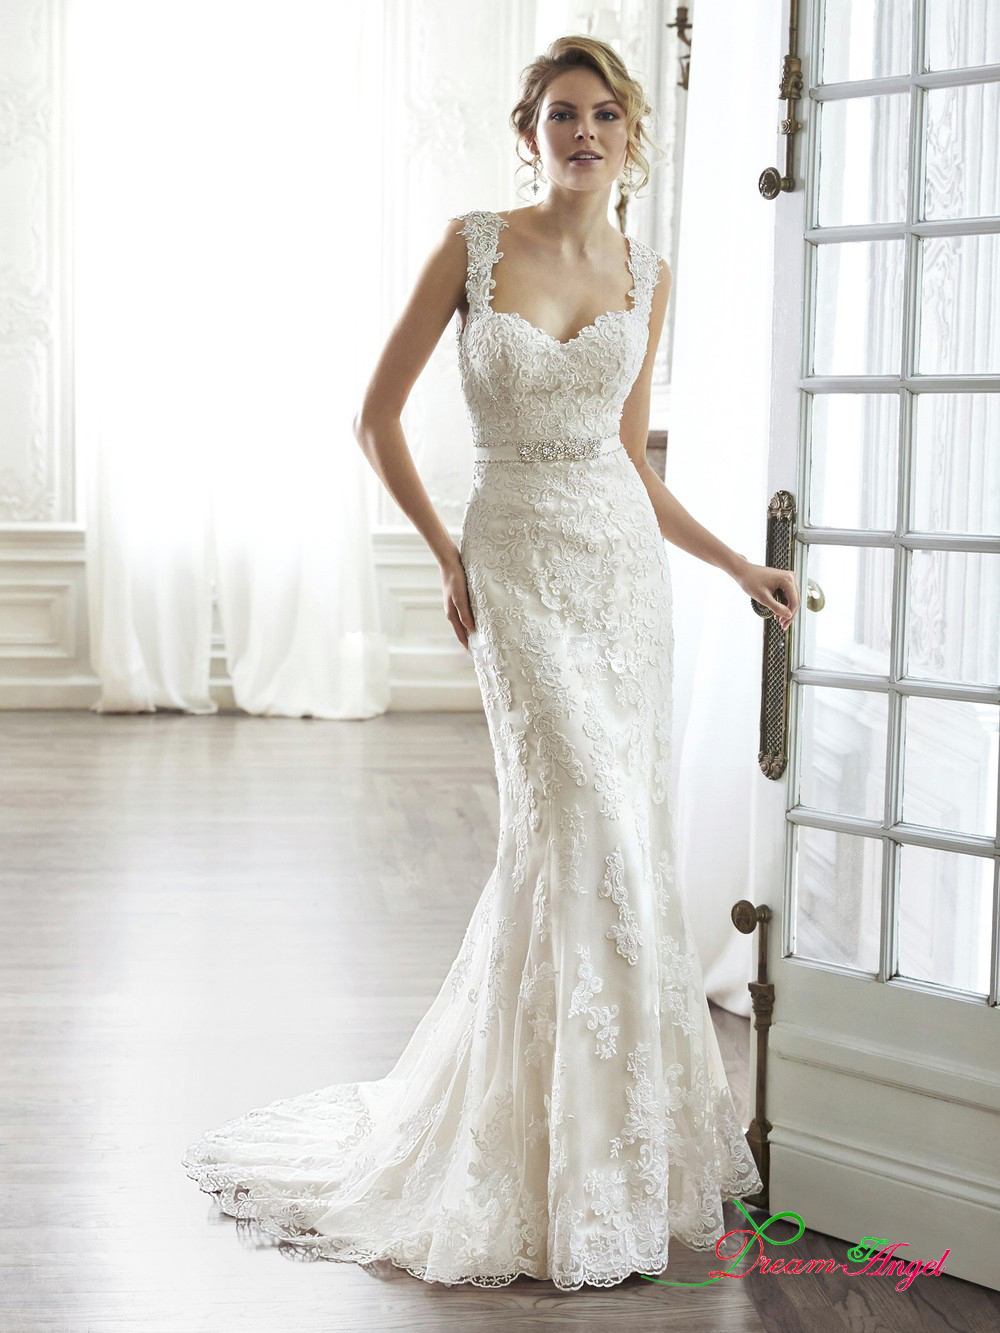 Popular celebrity wedding dresses buy cheap celebrity for Sexy wedding dress images